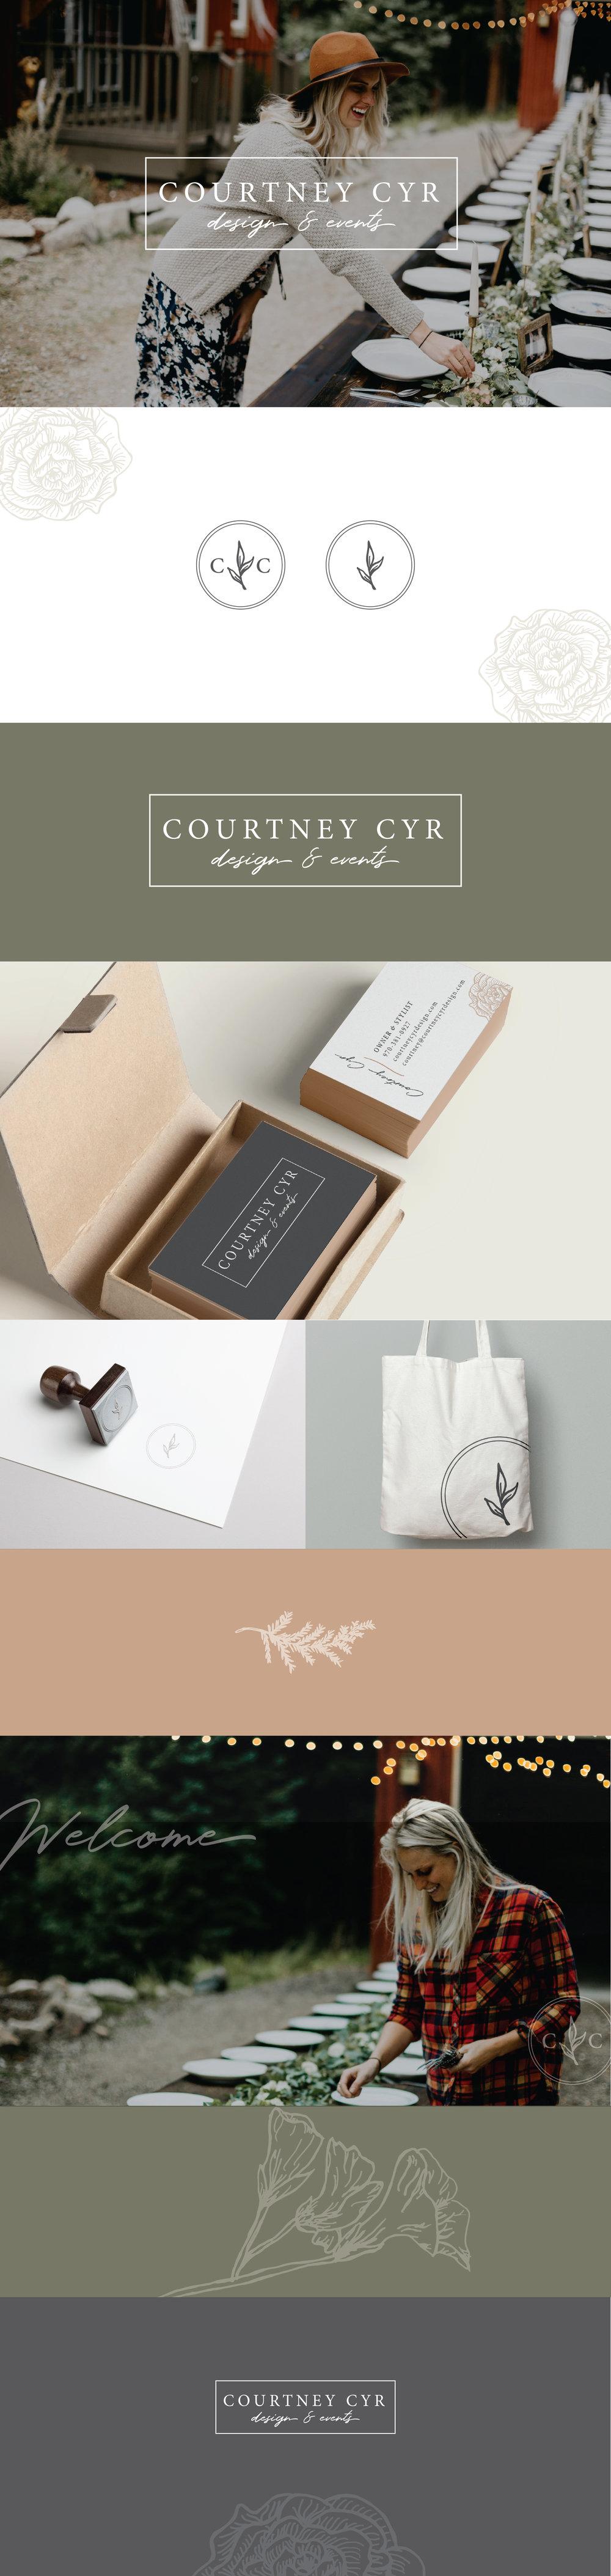 Good Day Design - Courtney Cyr Design Brand Reveal